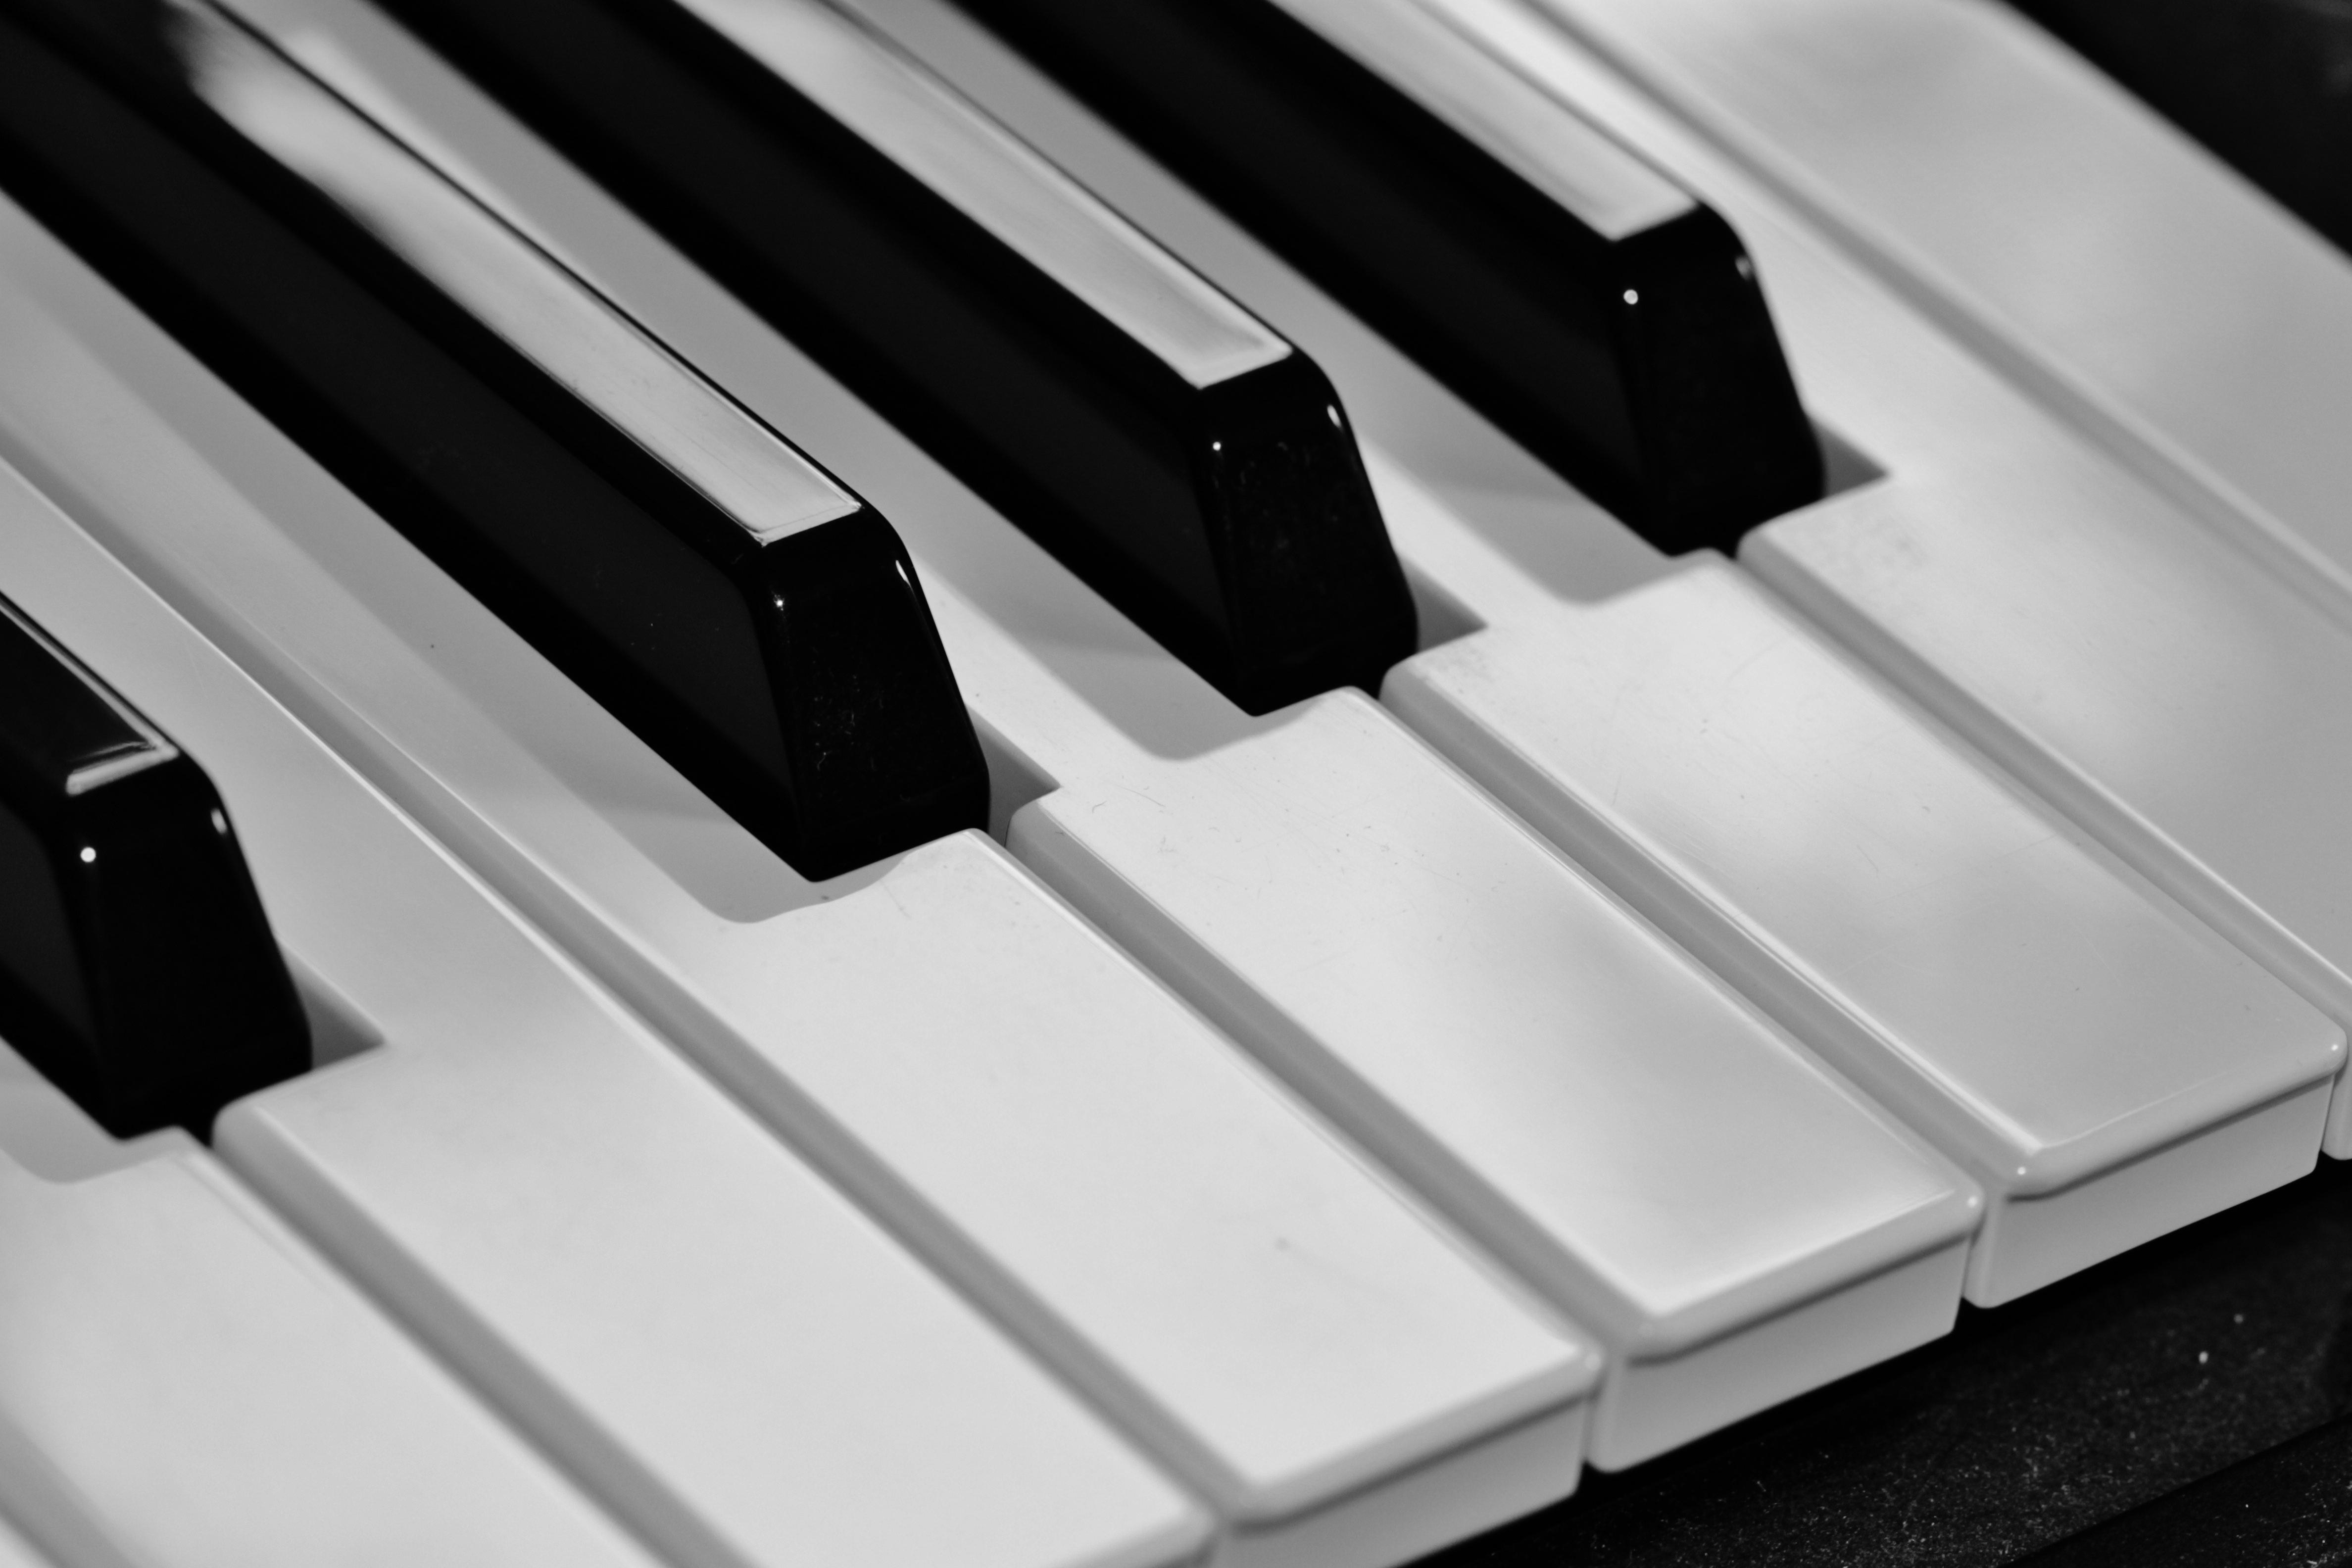 Gambar Alat Musik Warna Hitam Putih